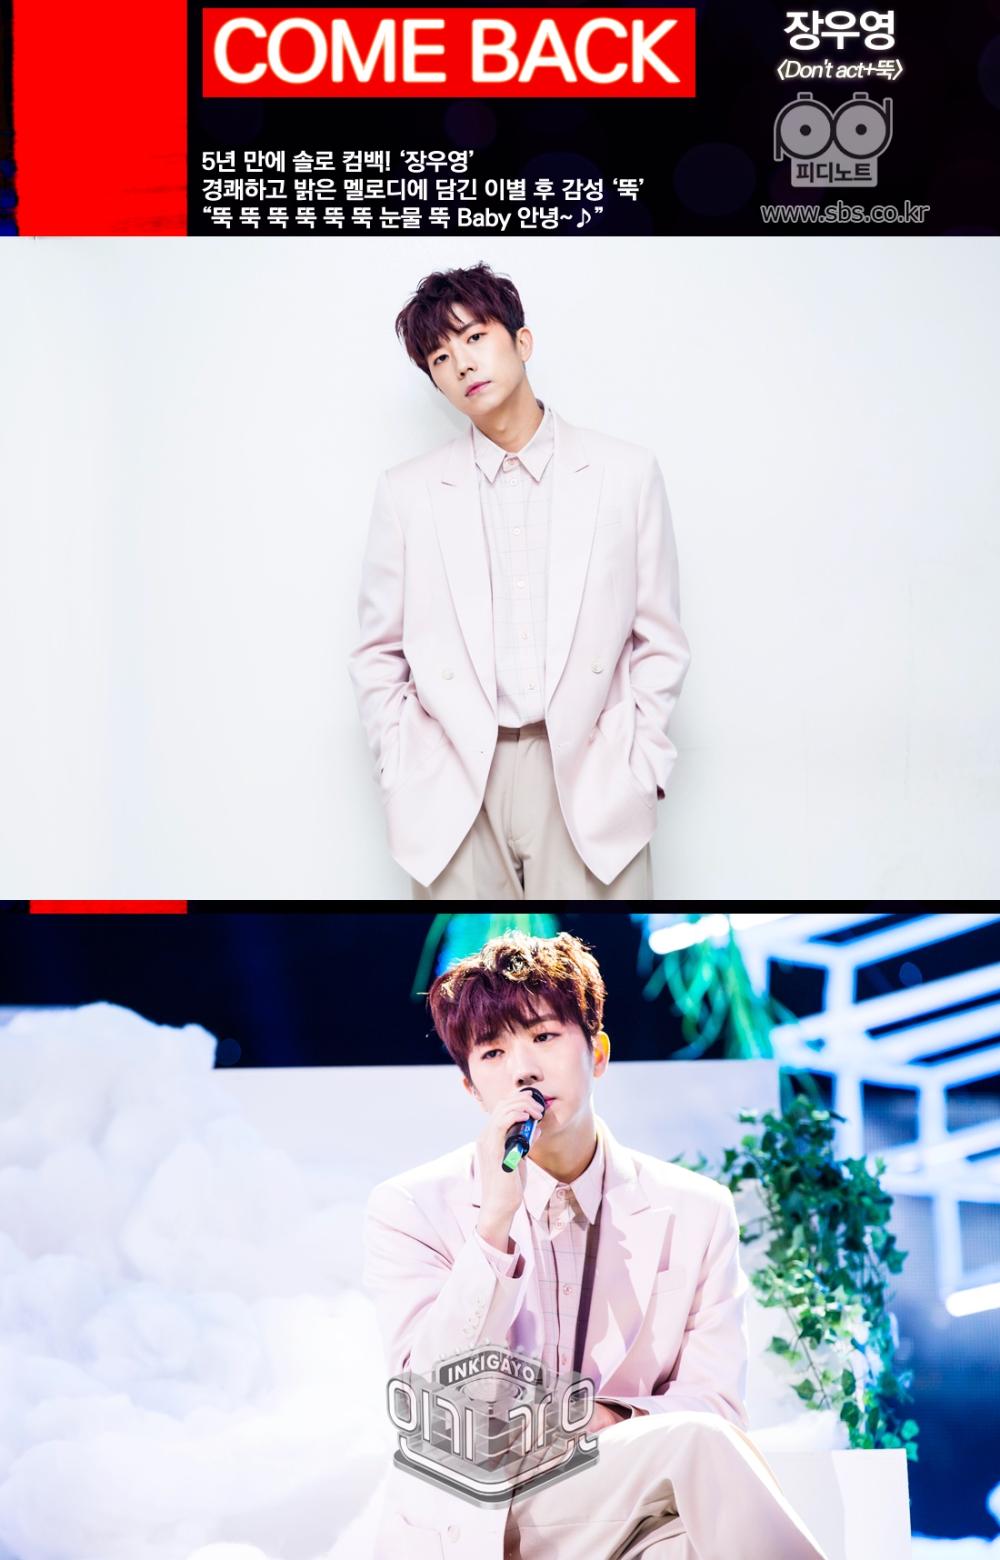 2PM의 장우영의 솔로 컴백을 했다.